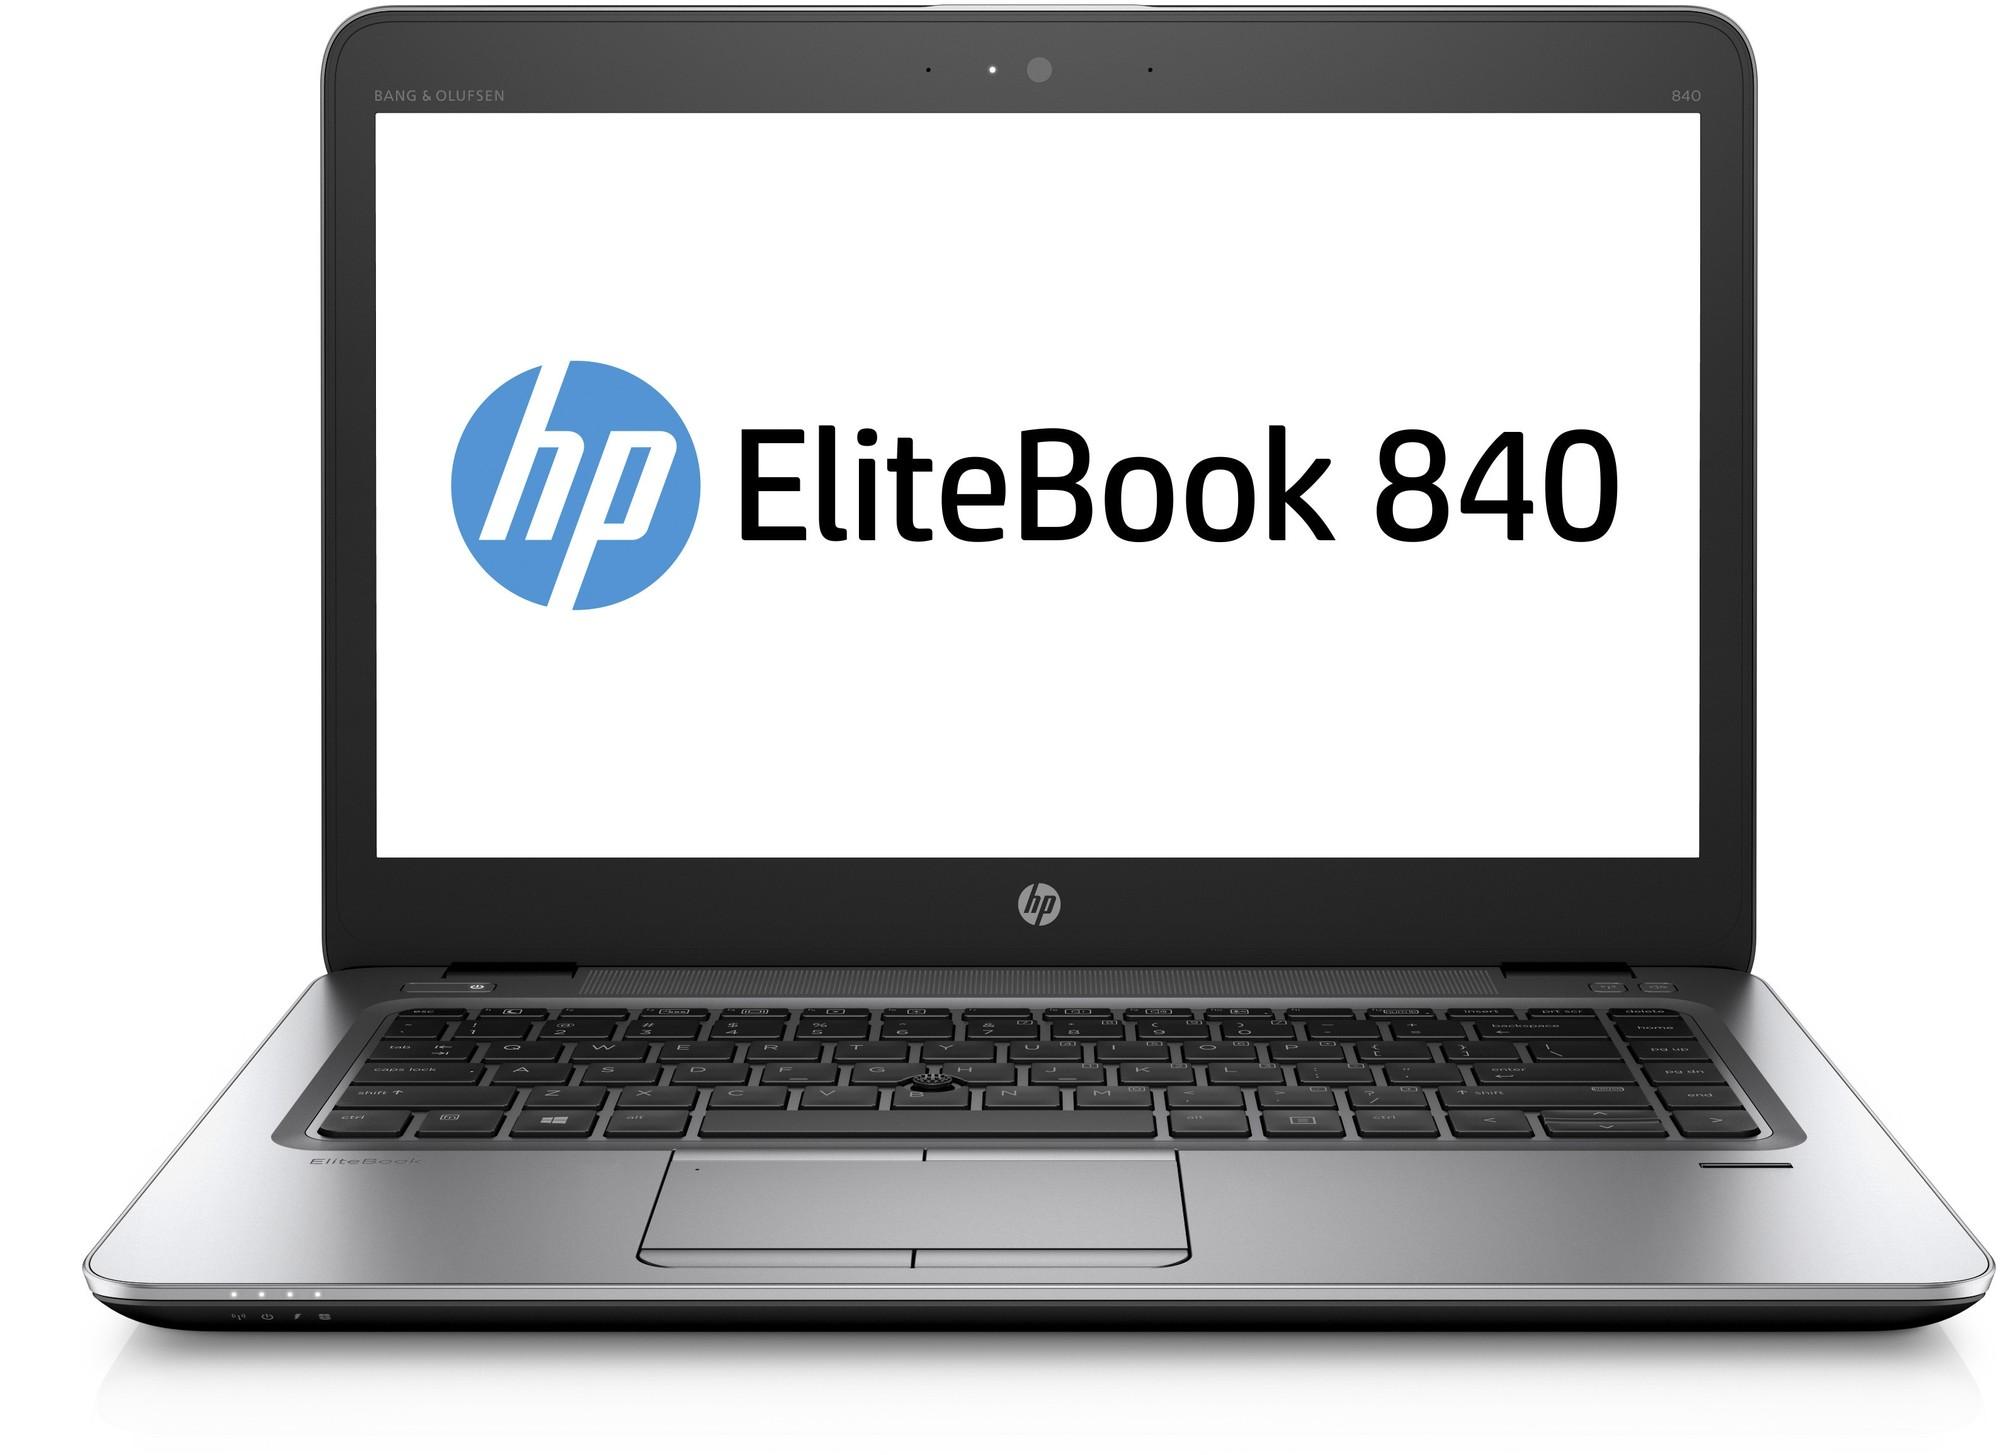 HP Elitebook 840 G3 - Intel Core i5 6300U - 8GB DDR4 - 256GB SSD - HDMI